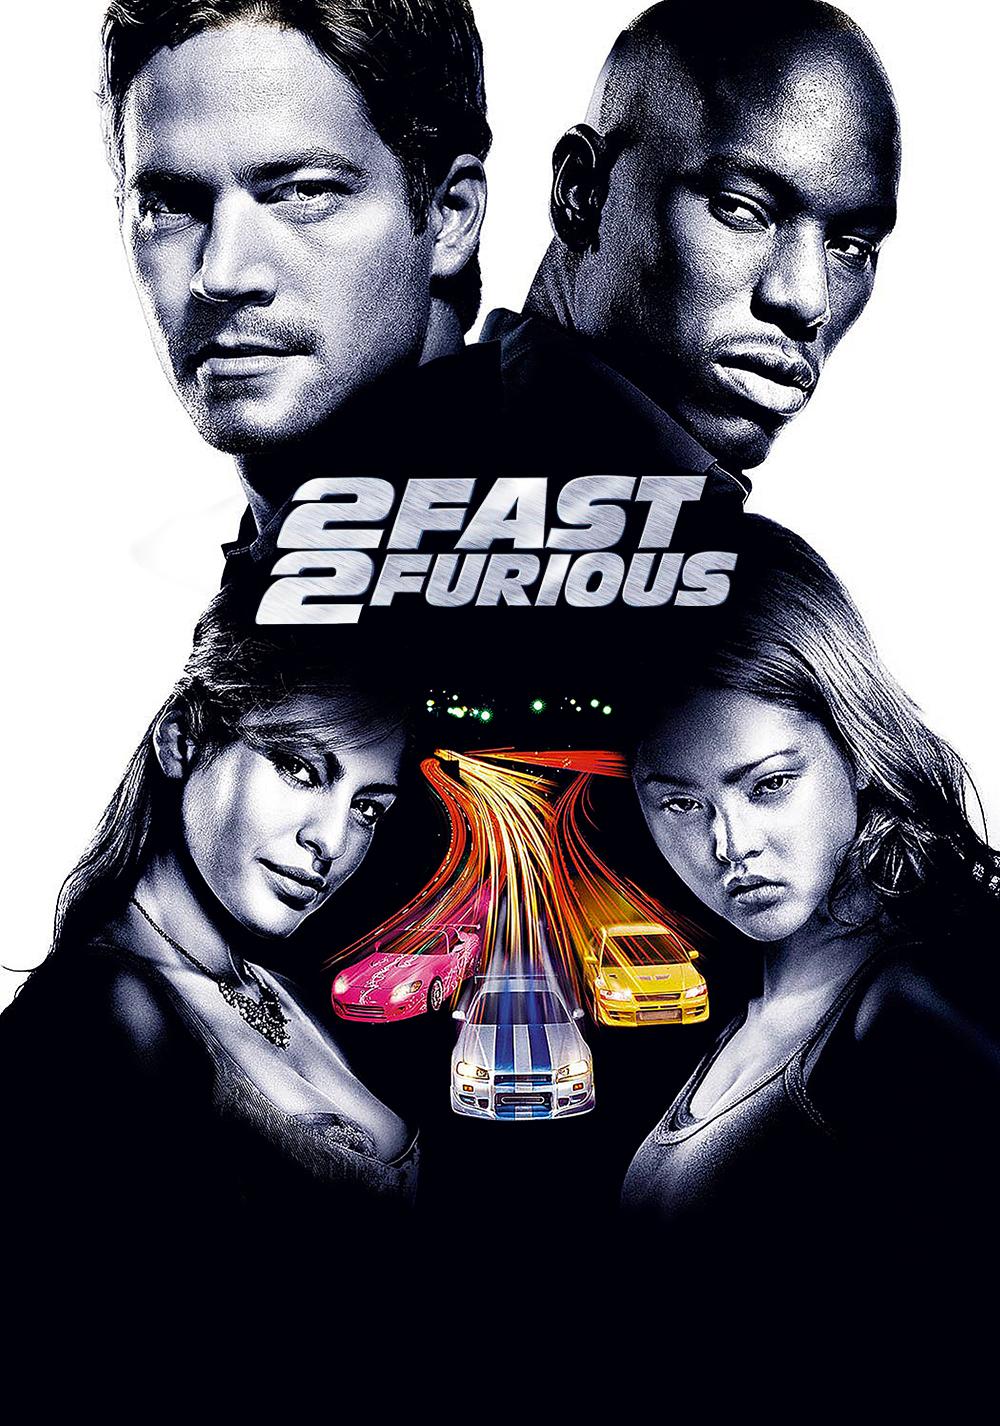 2 Fast 2 Furious Fanart